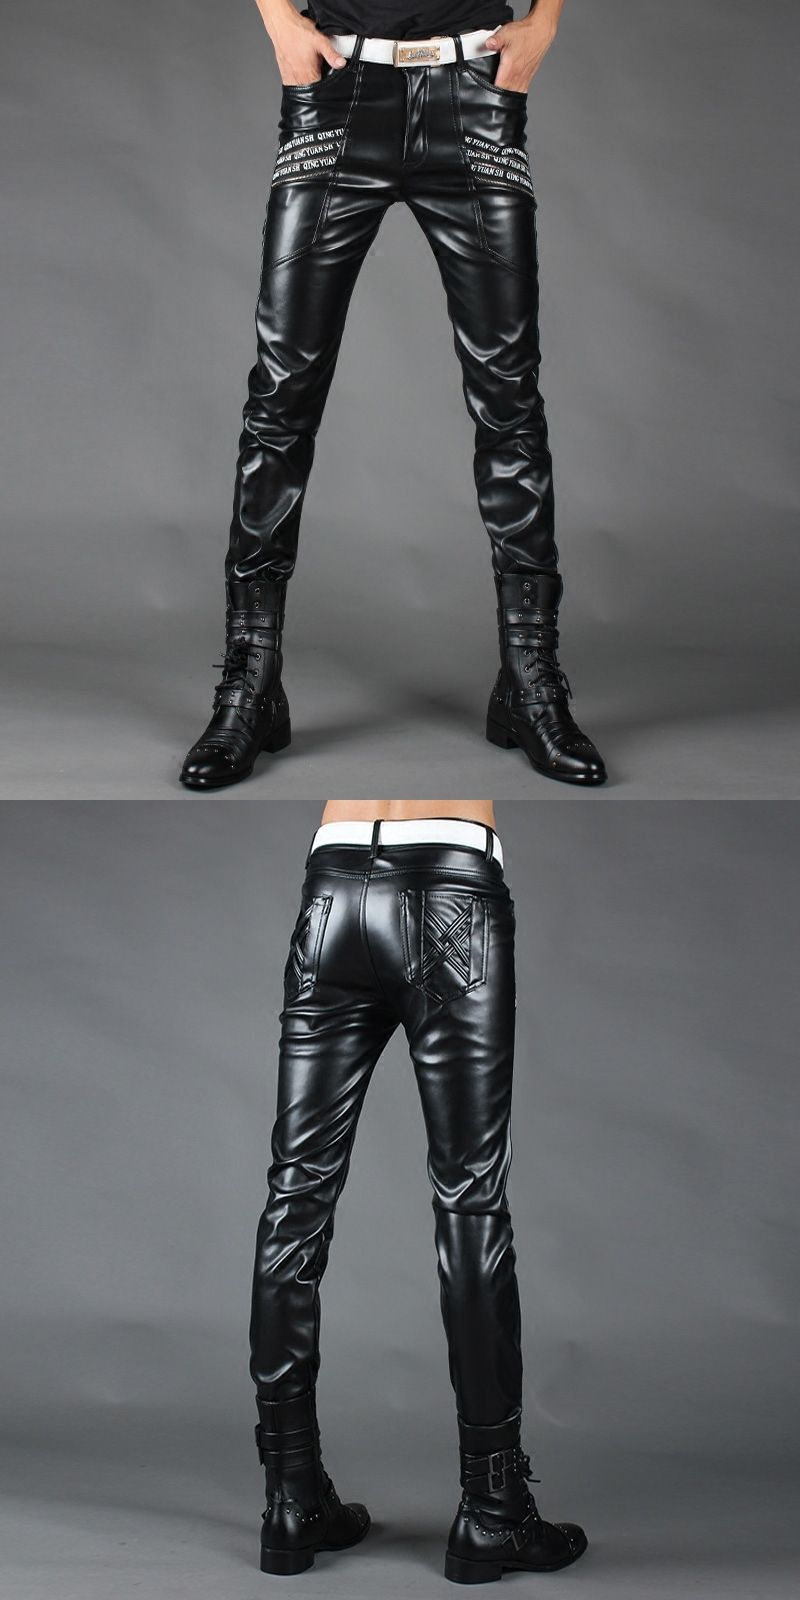 Black New Fashion Cuero Autumn Skinny Fit Winter Pantalones 2017 UwqCgHpx4